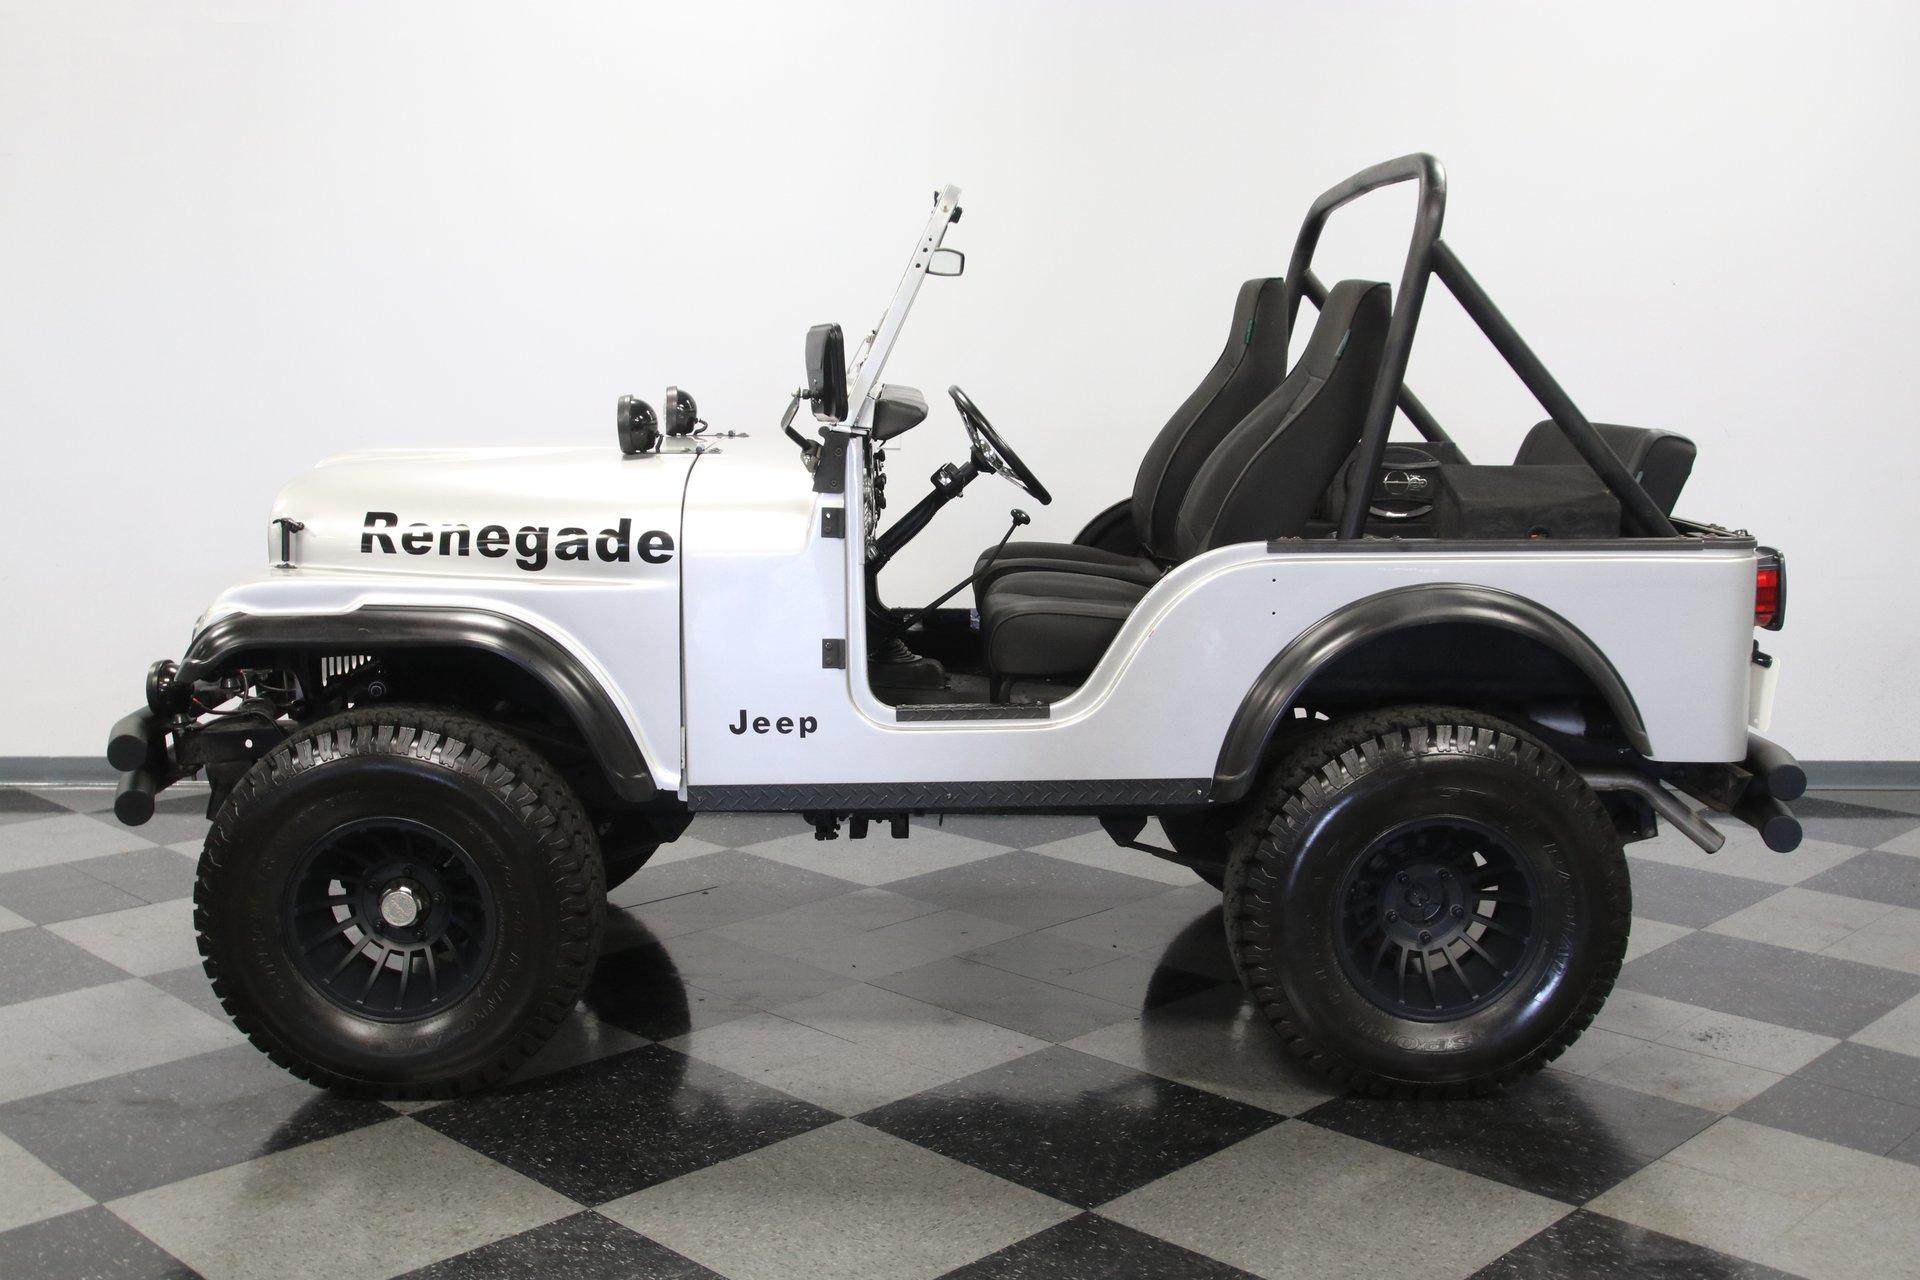 1971 jeep cj5 4x4 renegade